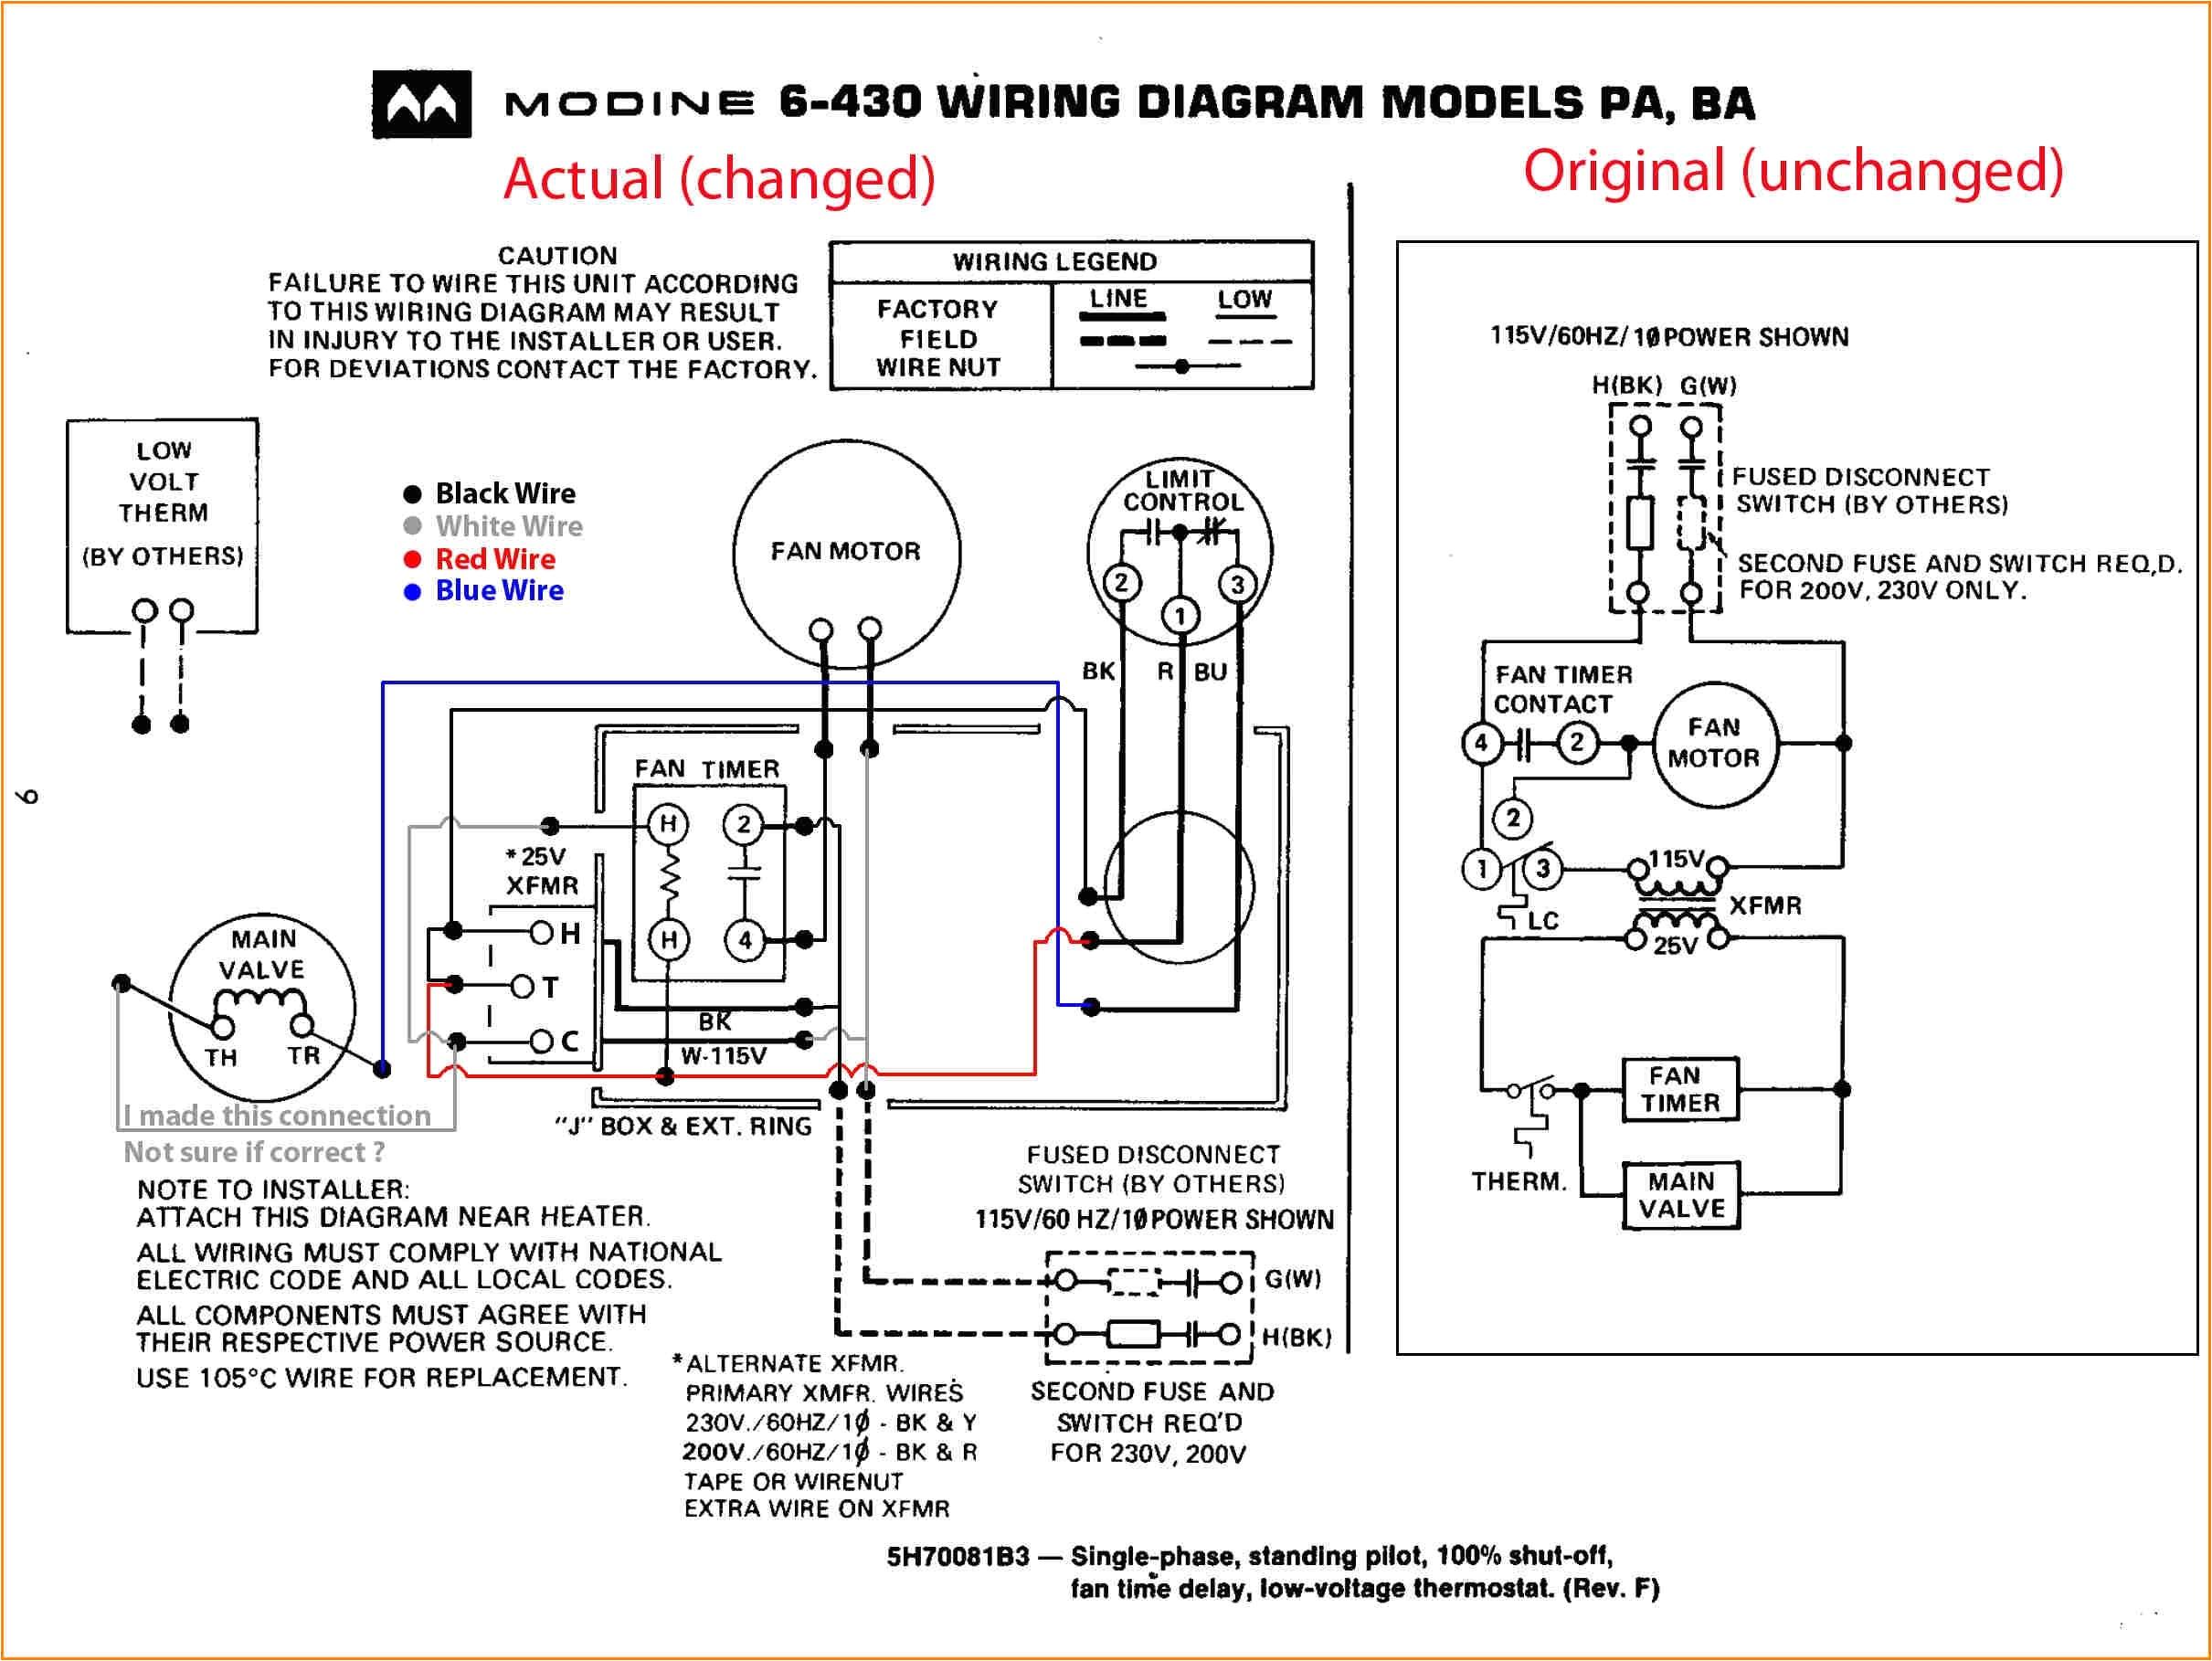 janitrol blower wiring diagram blog wiring diagram janitrol furnace wiring diagram janitrol wiring diagram source goodman heat pump